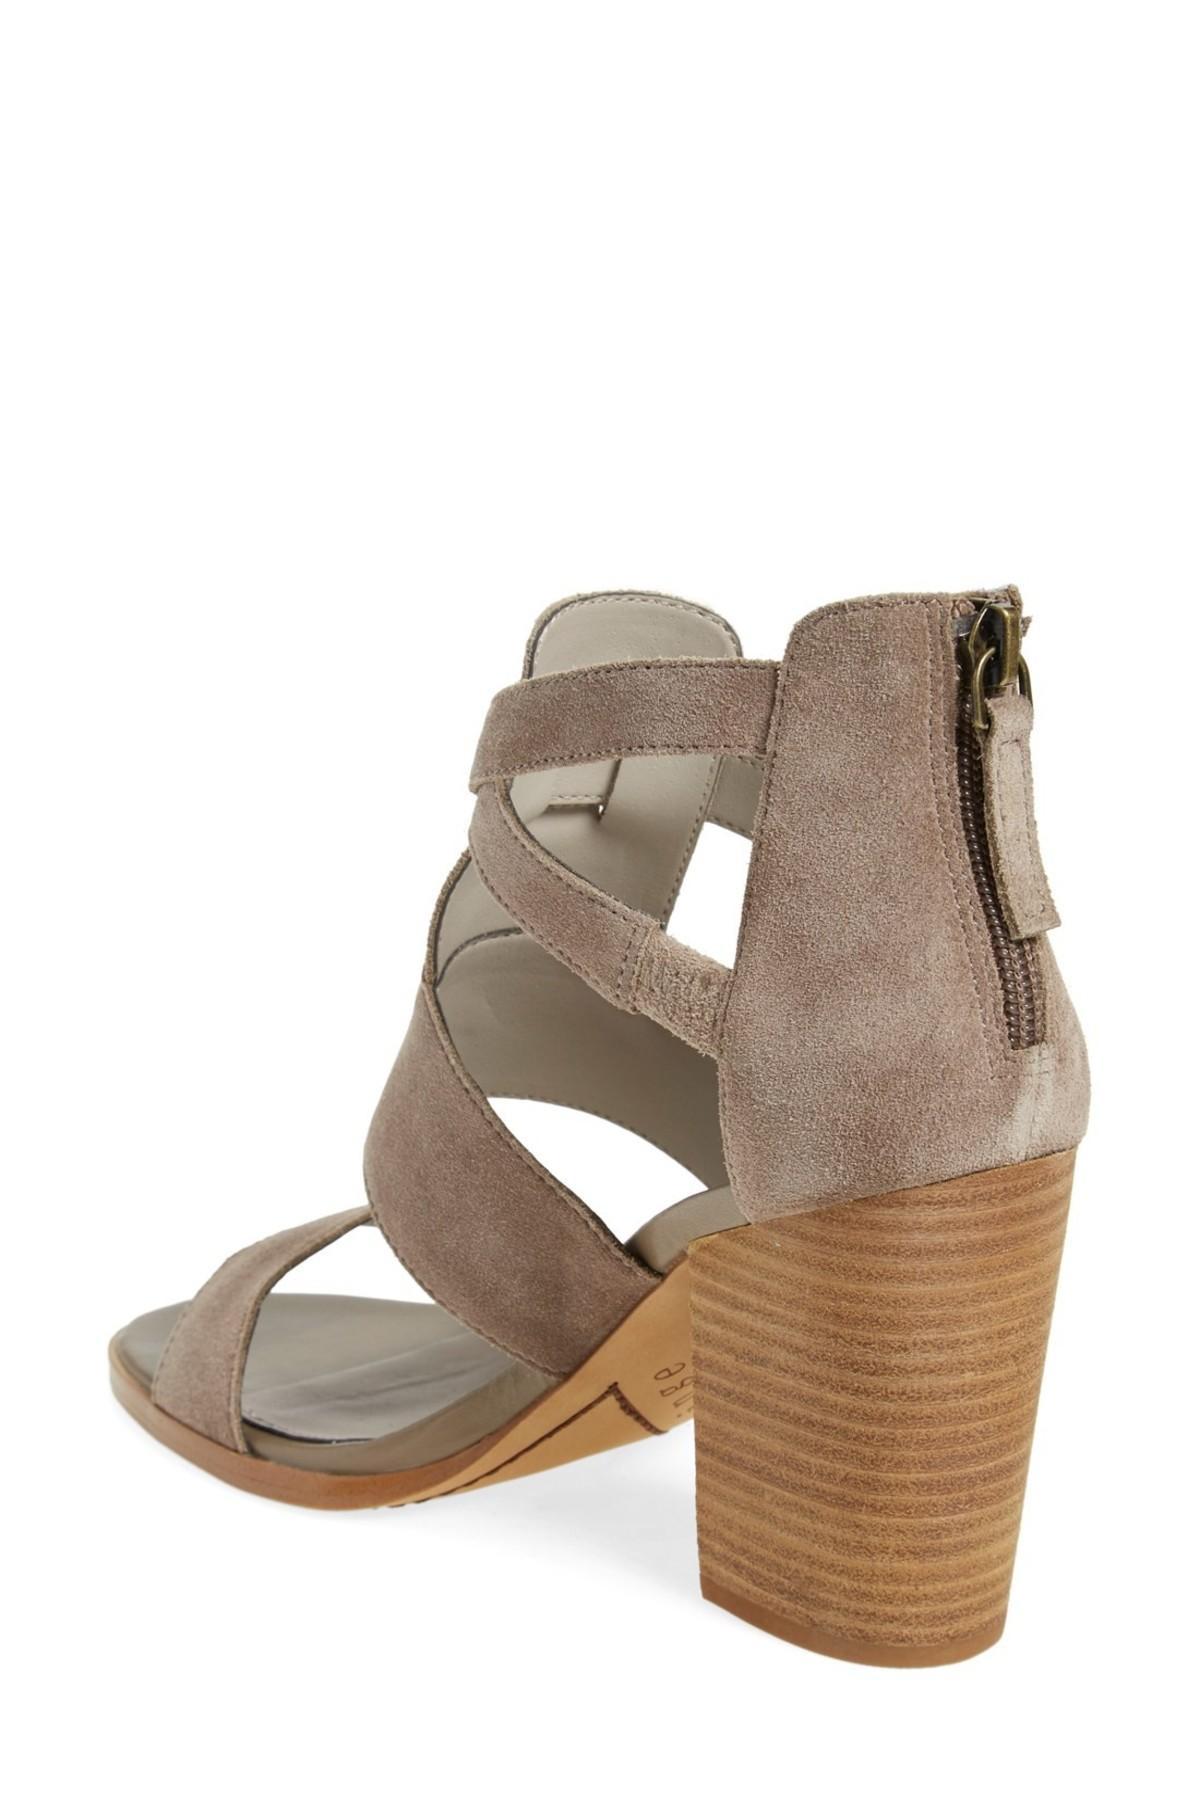 37ff57f772b Lyst - Hinge Cora Block Heel Sandal